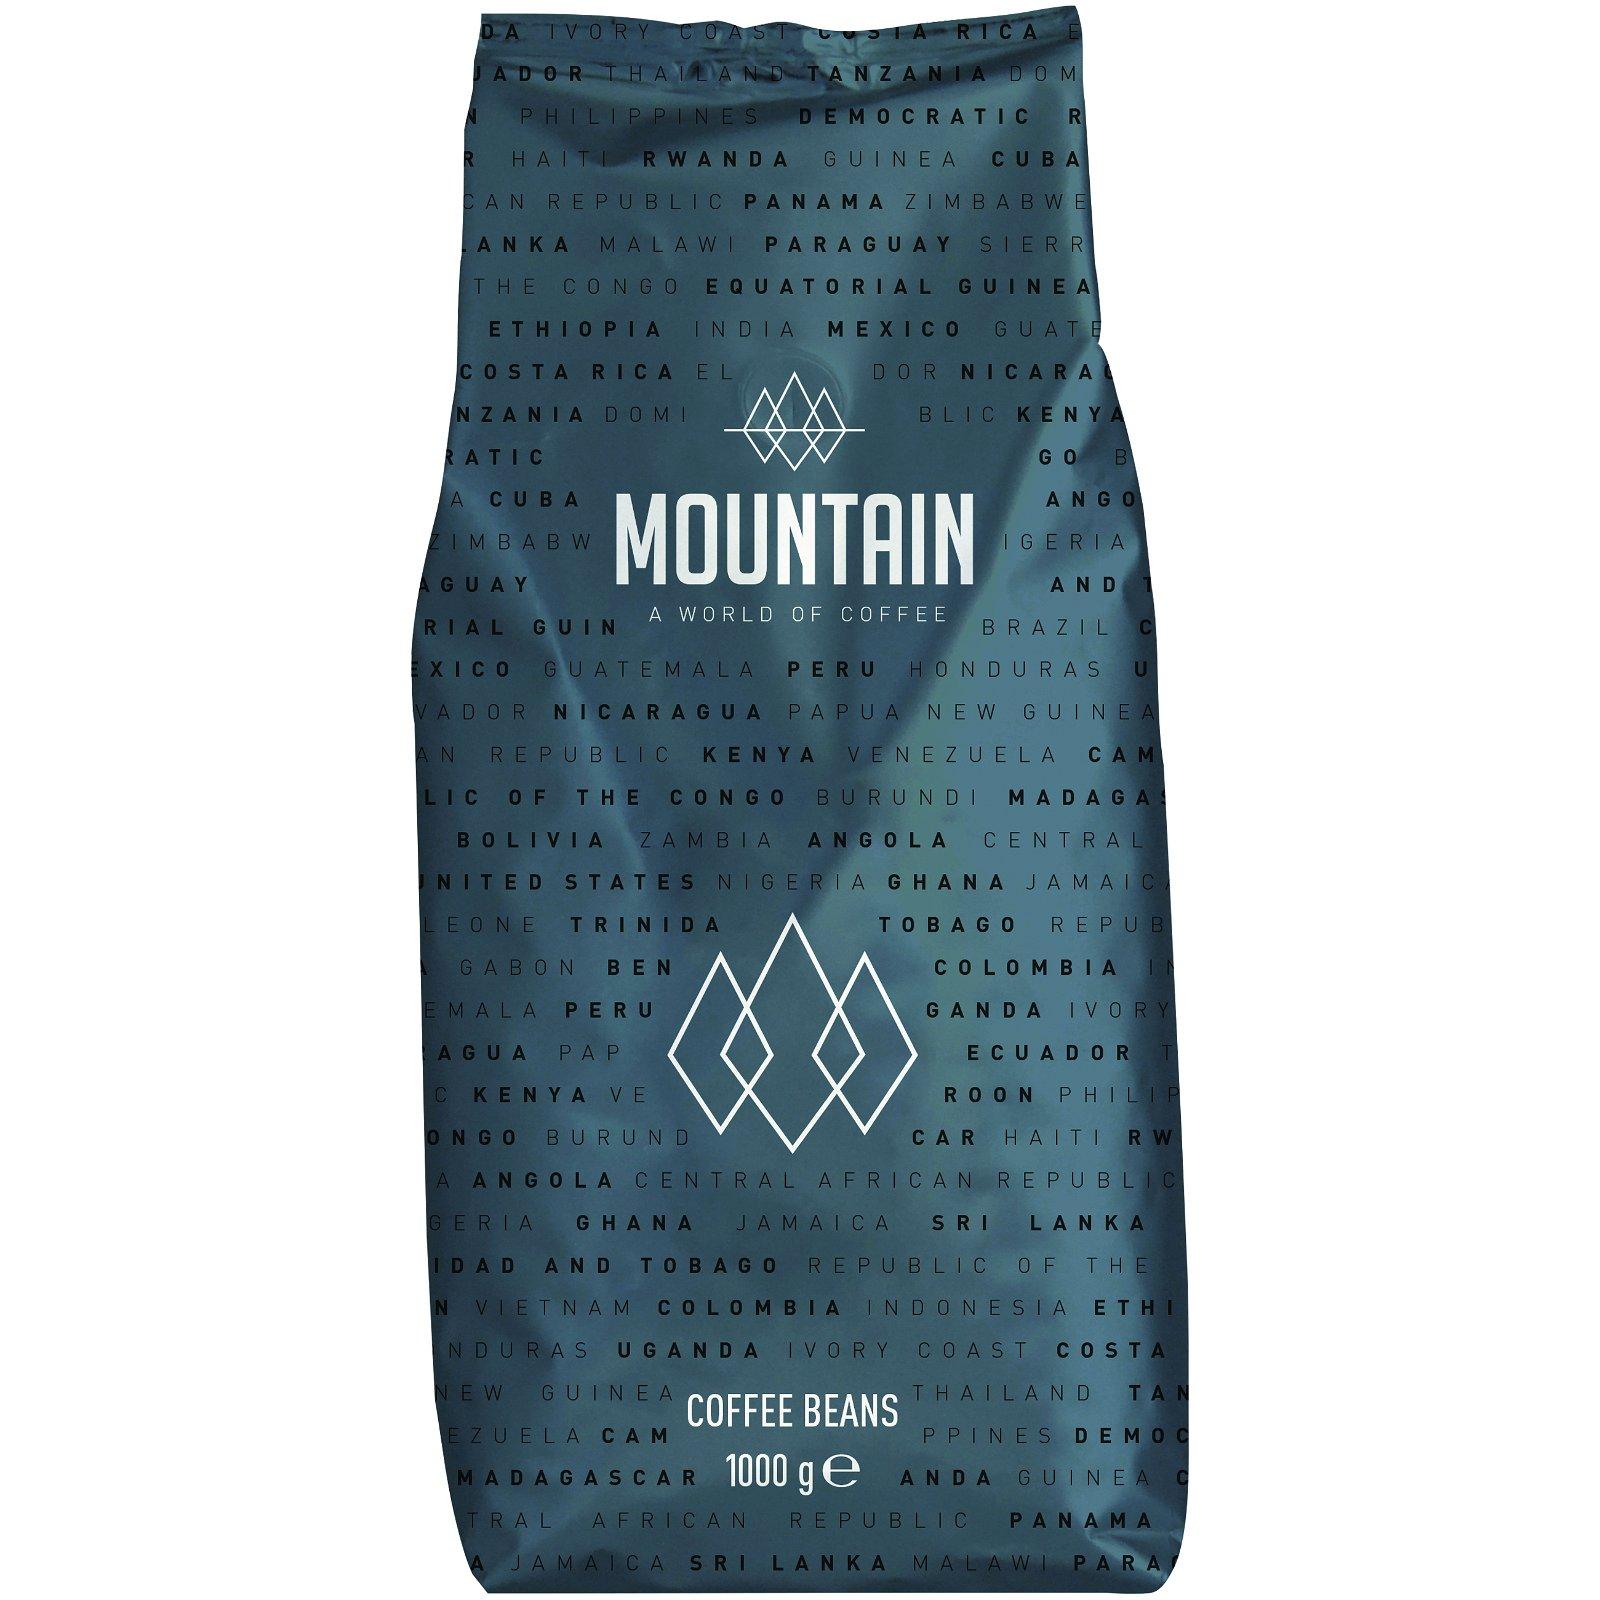 BKI Mountain House Blend 3 kaffe